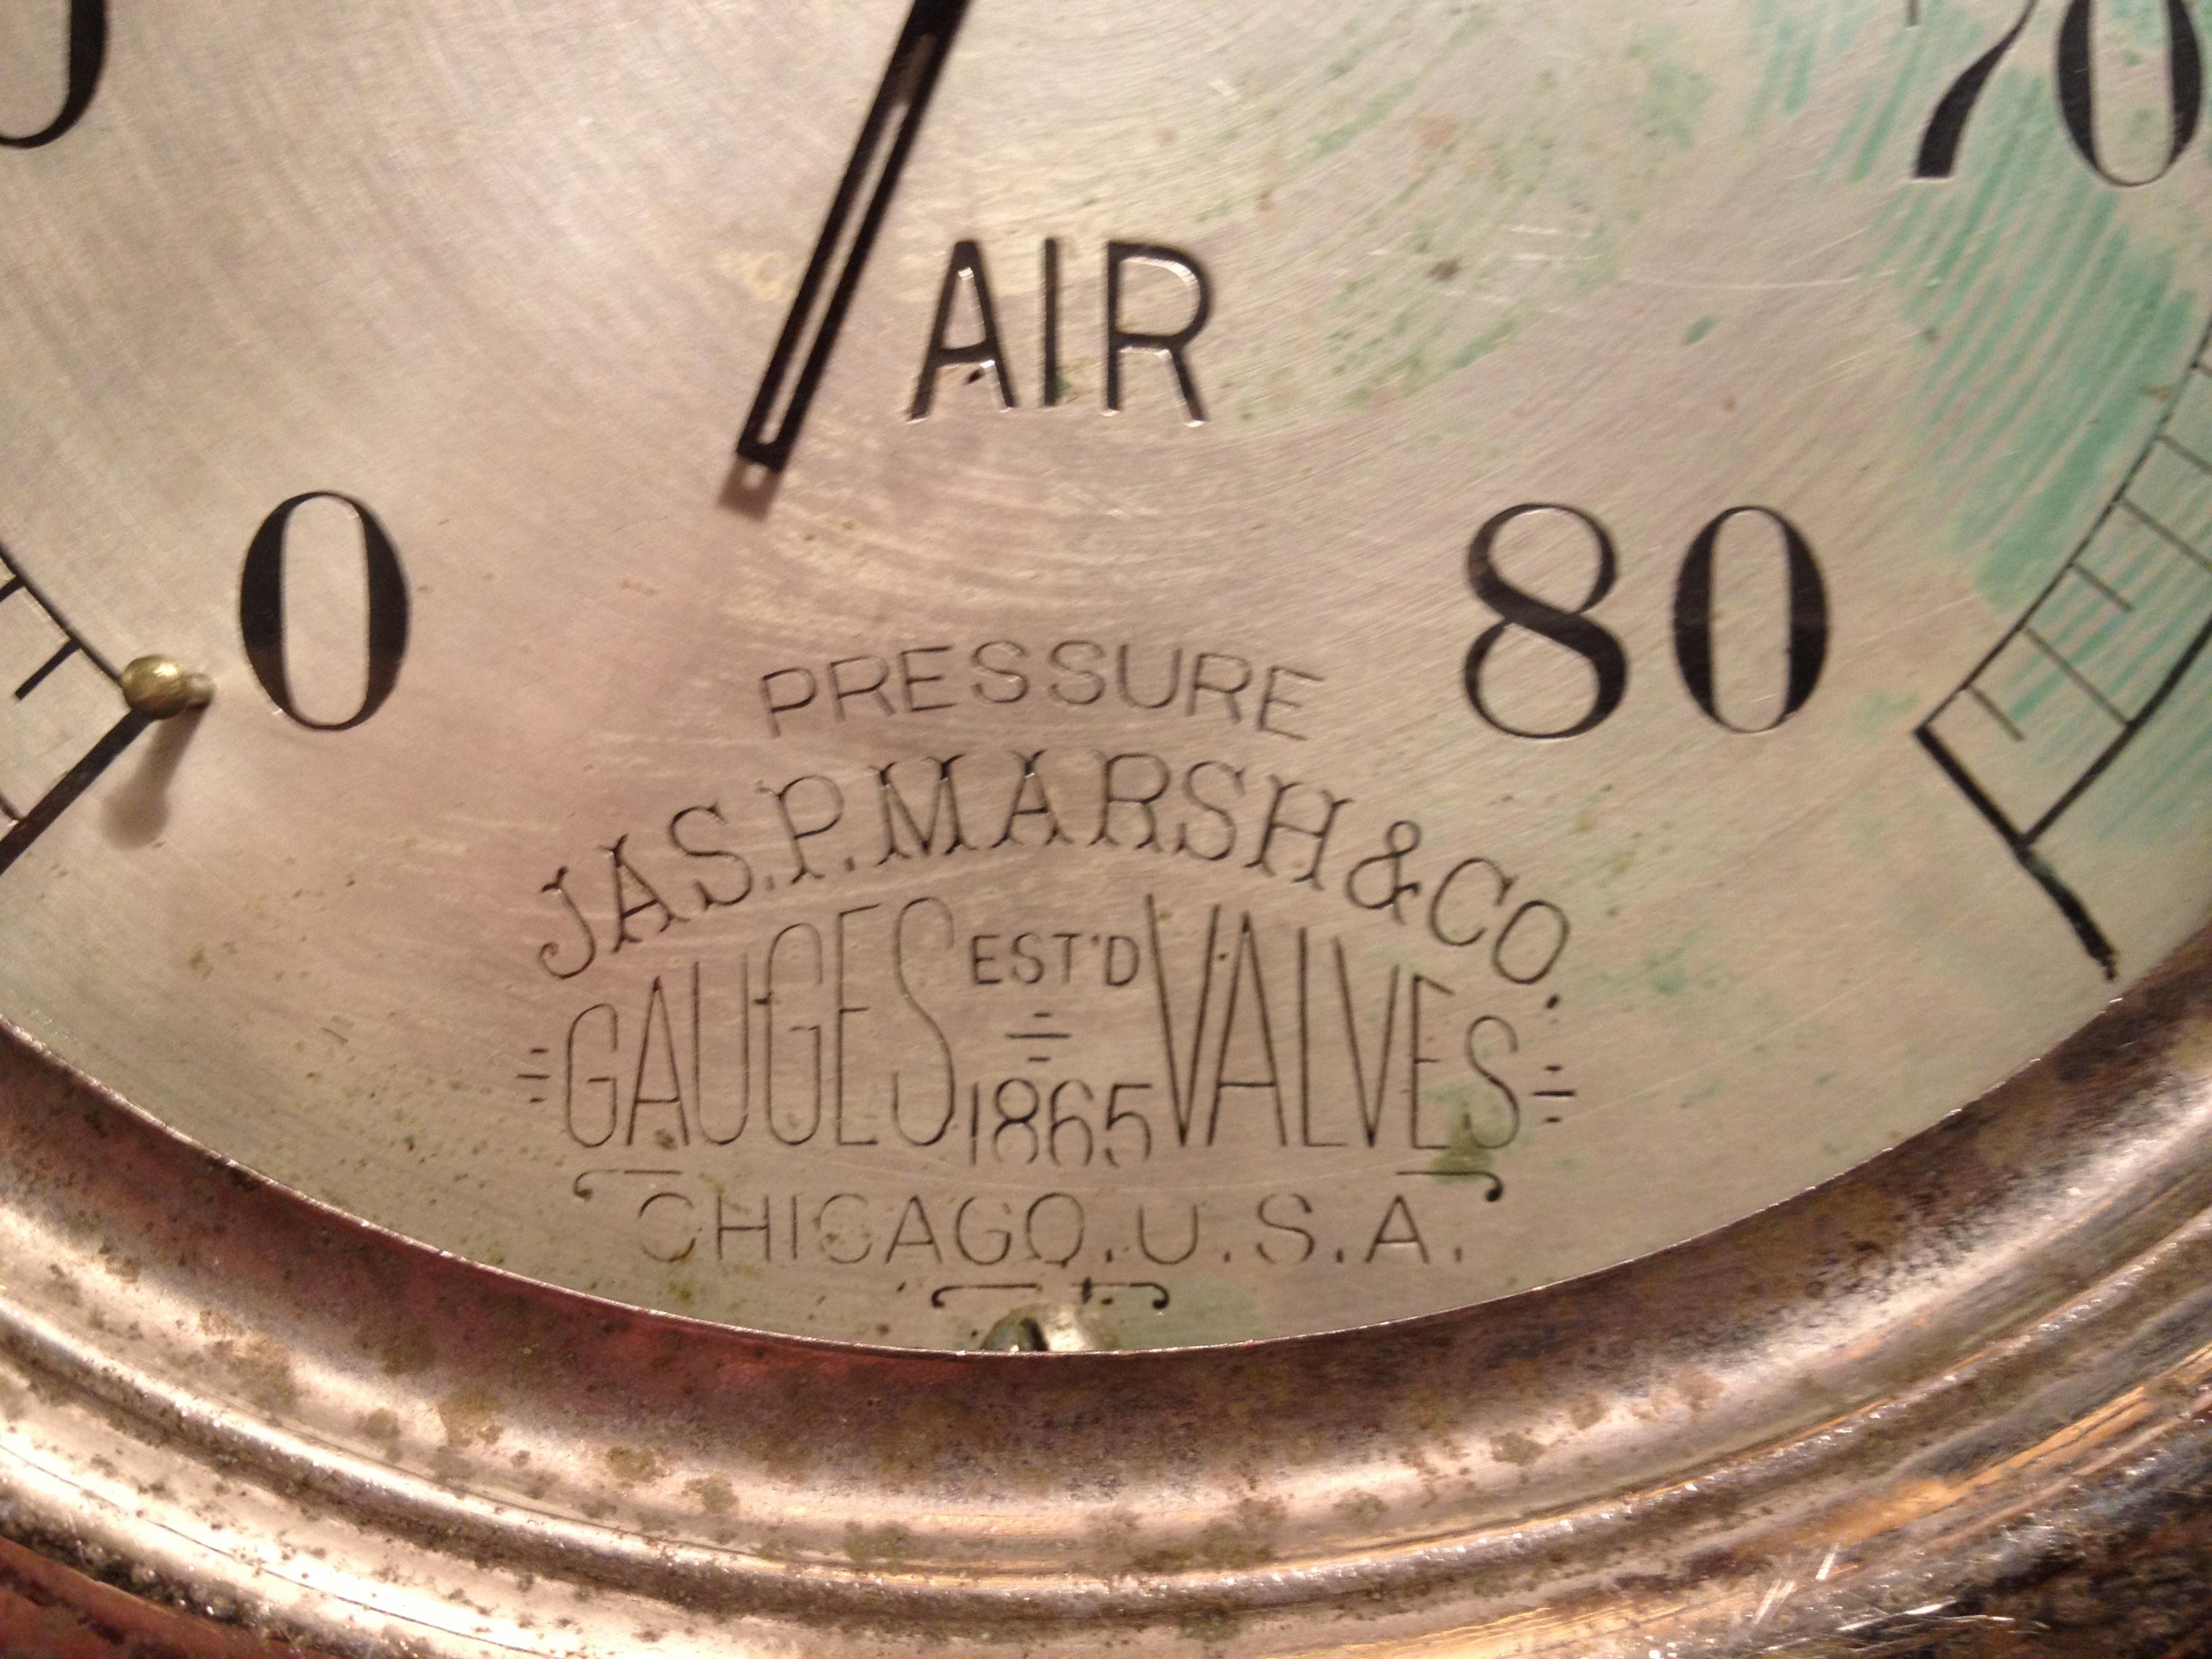 i_gearz_steampunk_hand_made_steam_pressure_gauge_clock_6_battery_op_antique_vintage_clocks_8.JPG